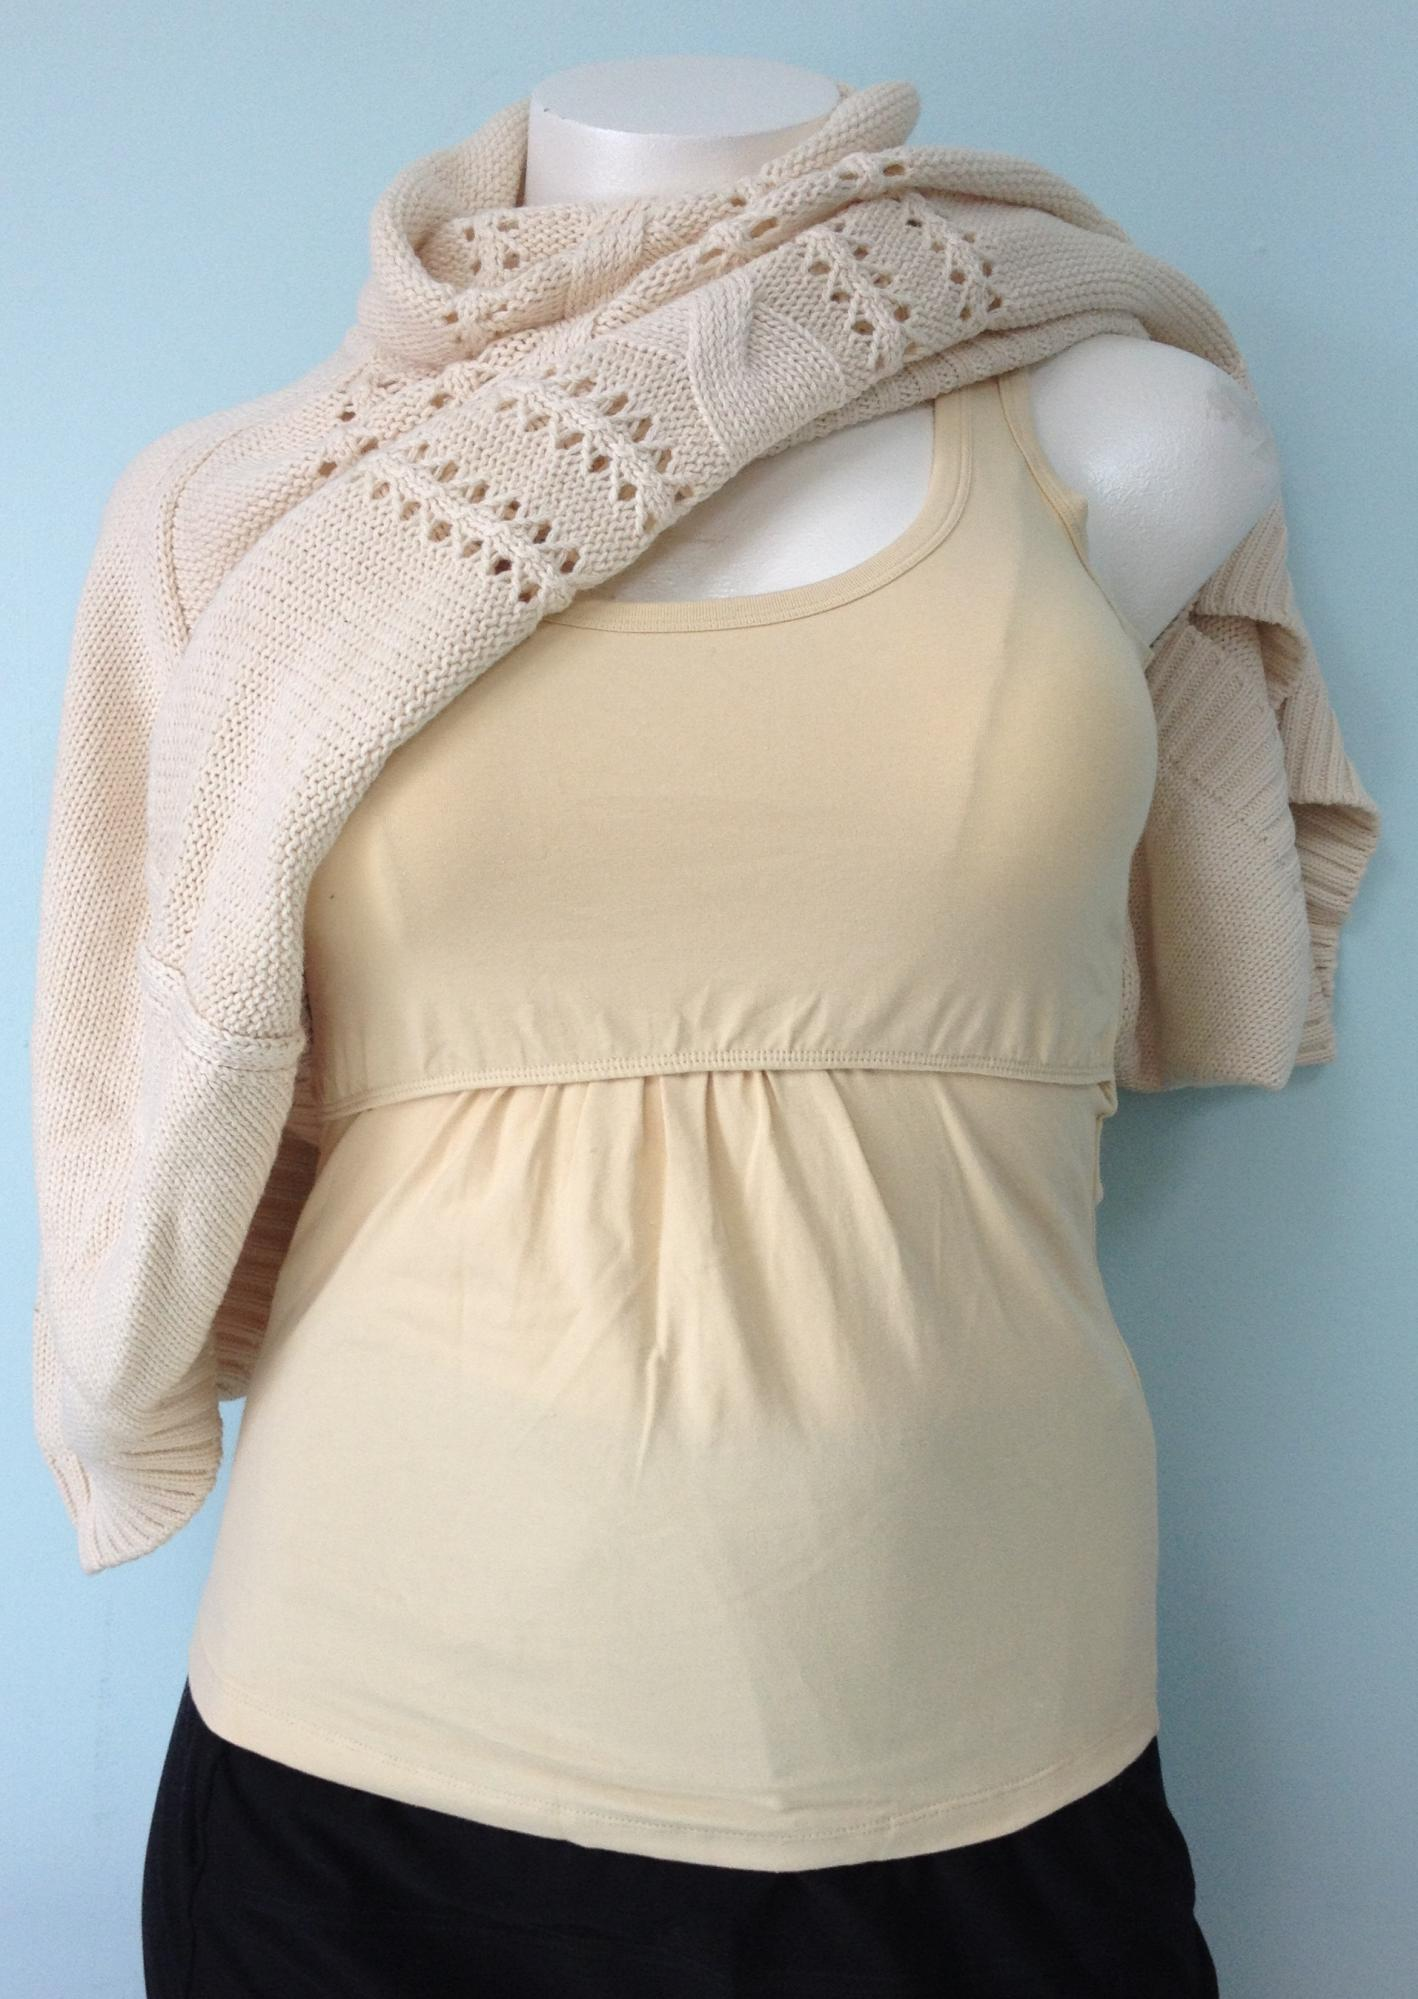 mothers-en-vogue-cable-knit-nursing-poncho-sweater-magnolia-tank-2.jpg